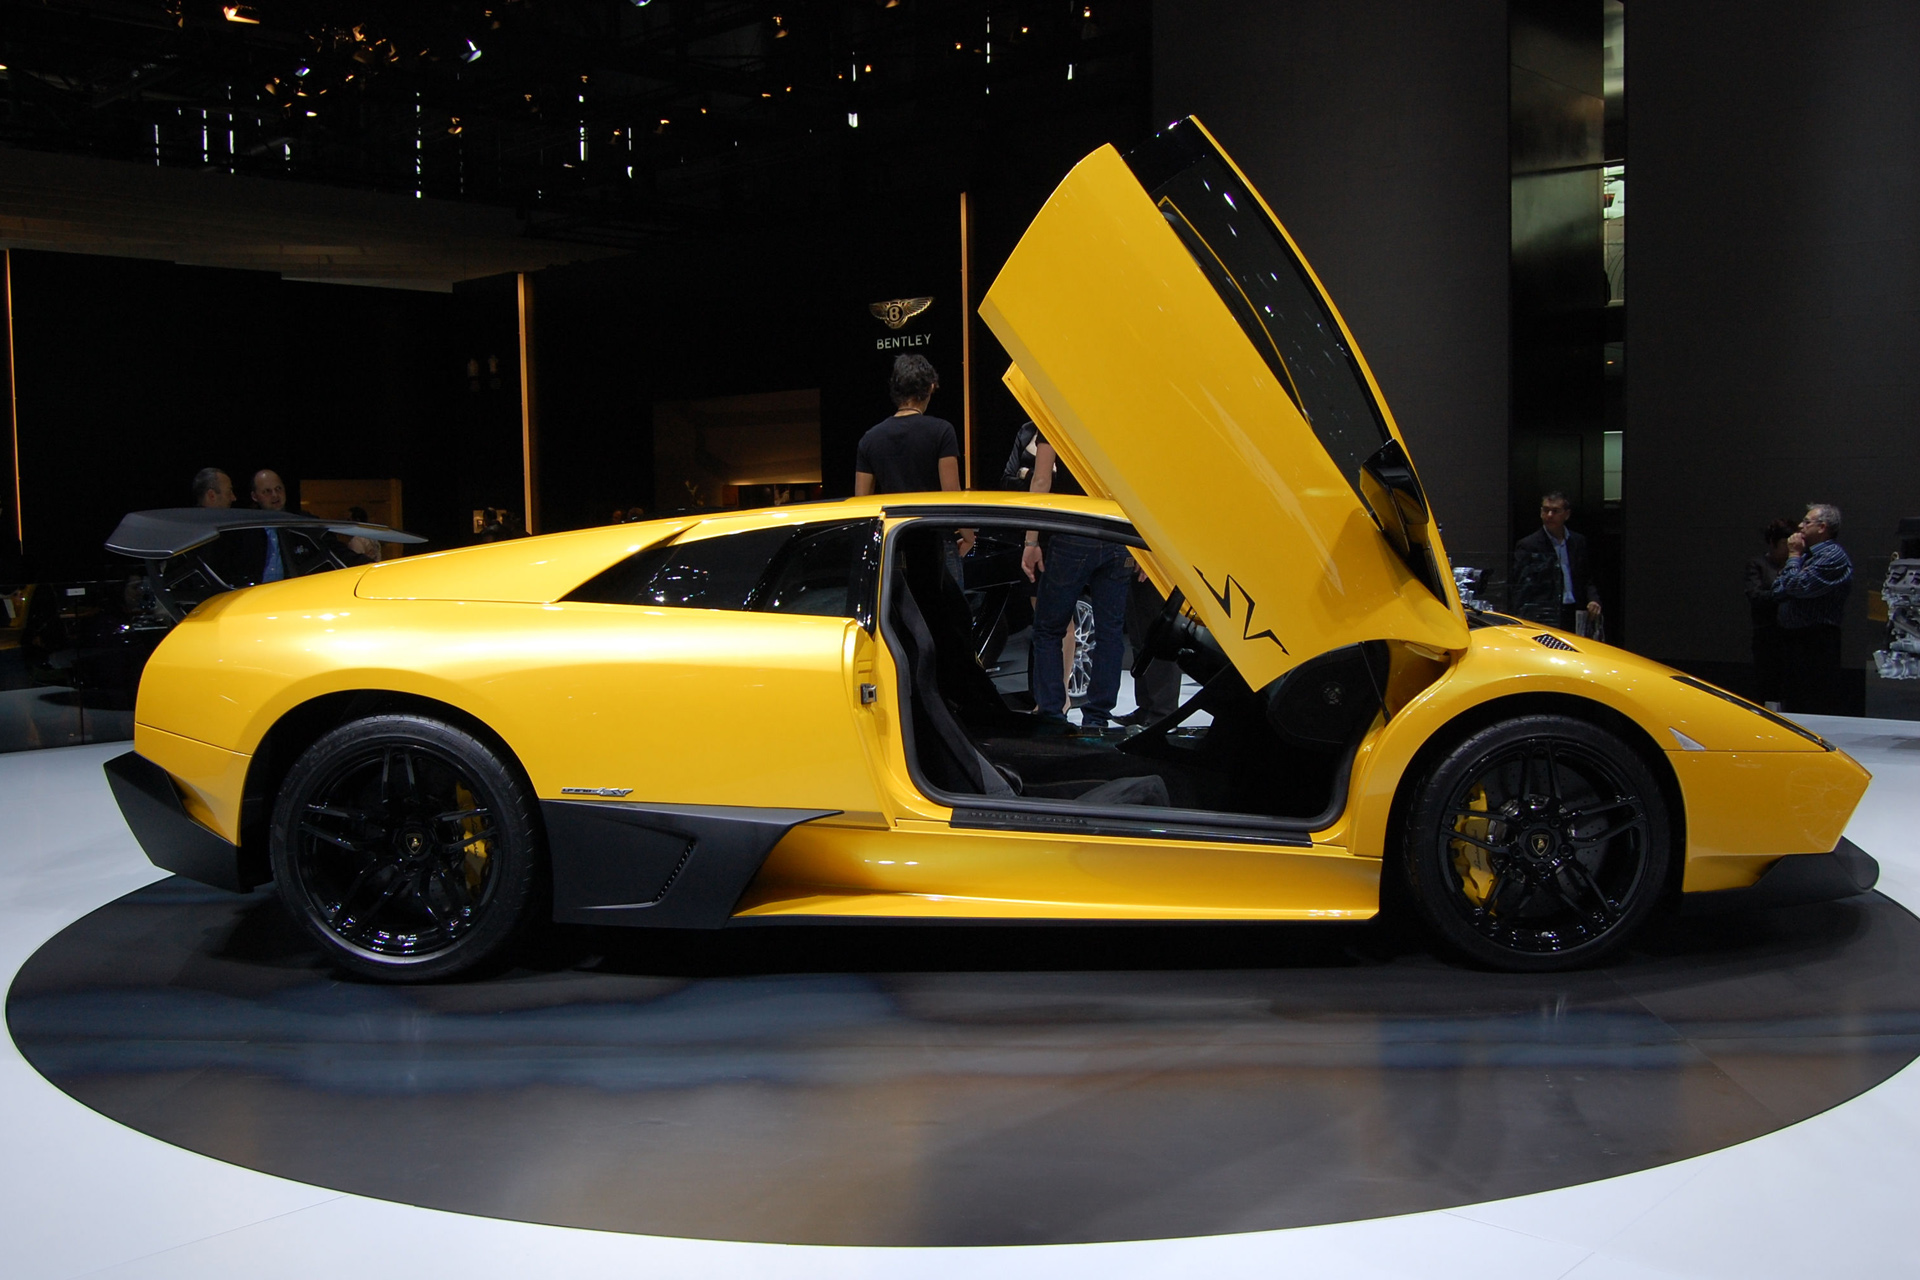 Lamborghini Murcielago LP670-4 SuperVeloce photo #63659